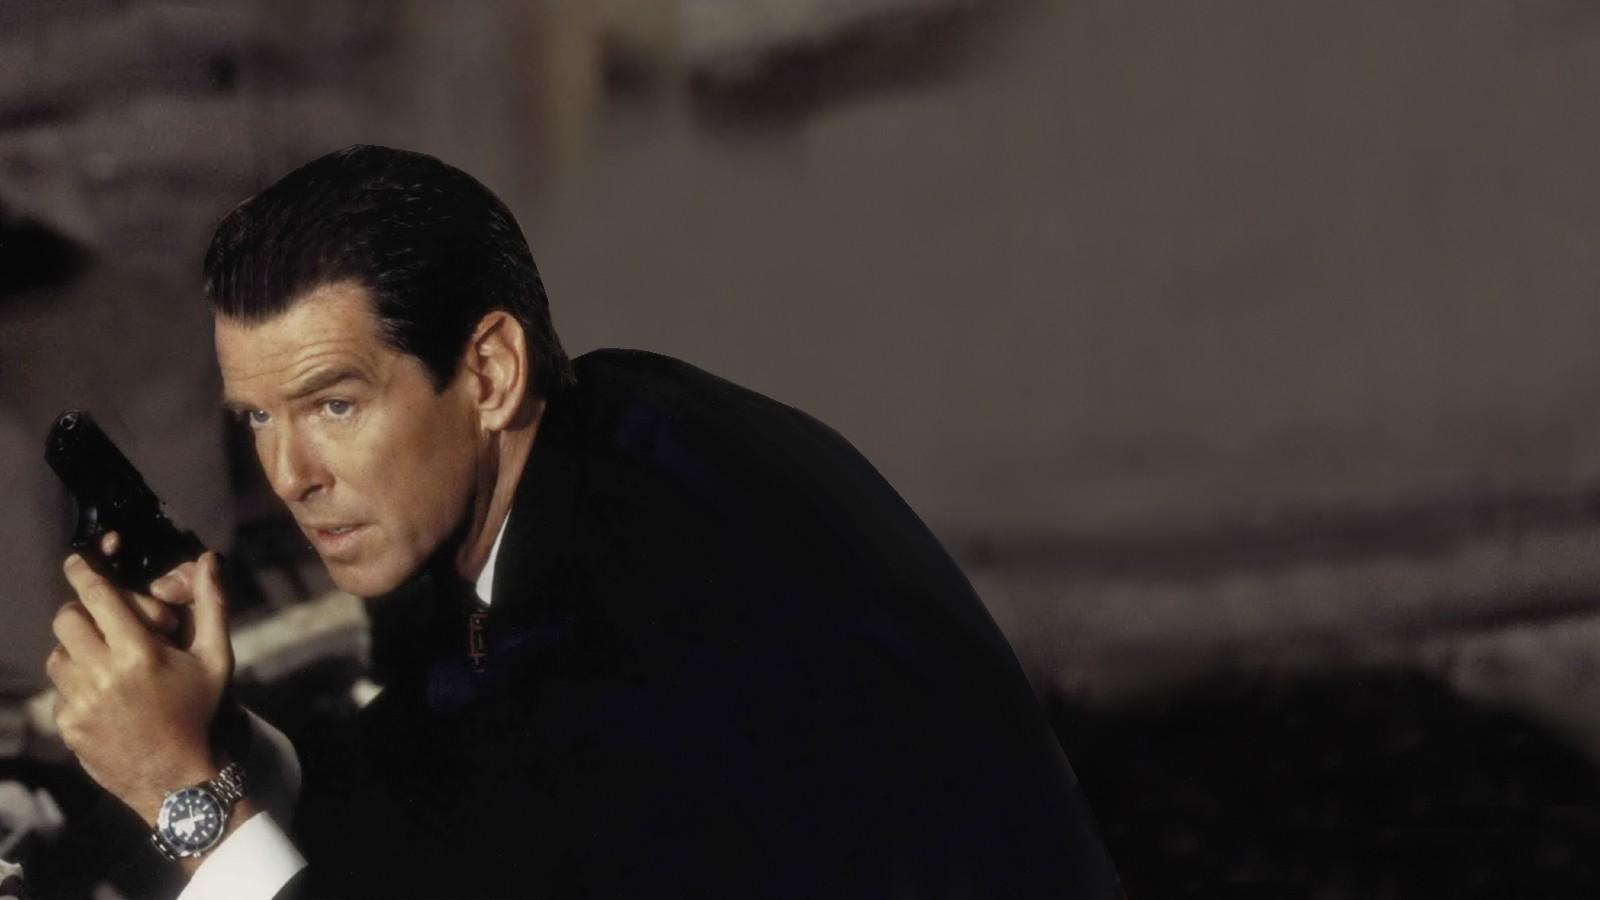 James Bond med sin Omegaklocka. Bild: cloudfront